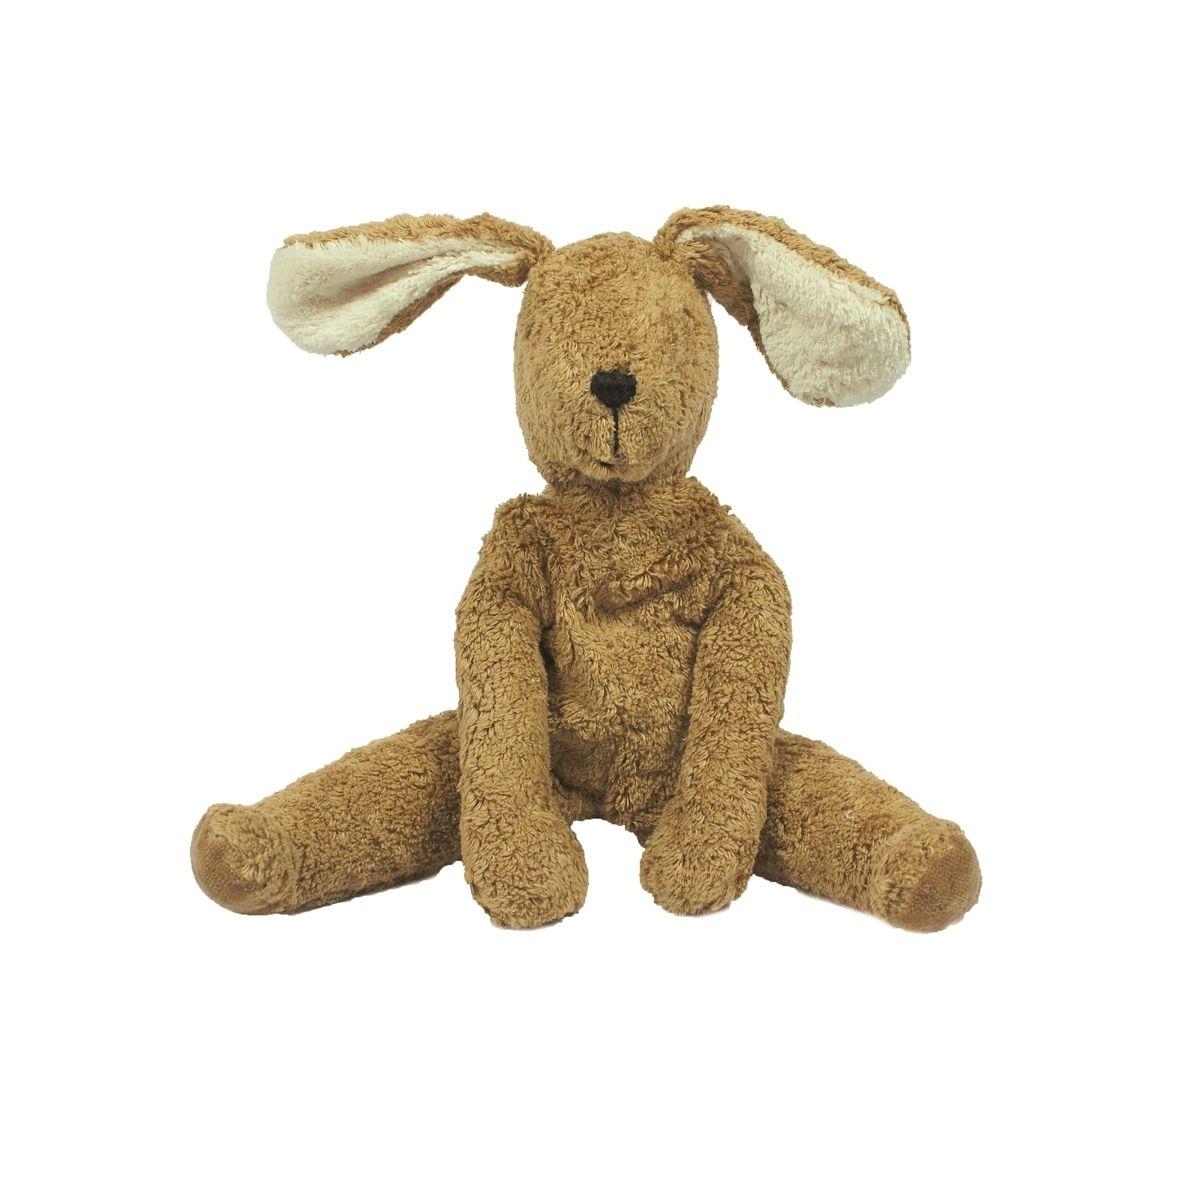 Senger Naturwelt Floppy animal Rabbit large beige